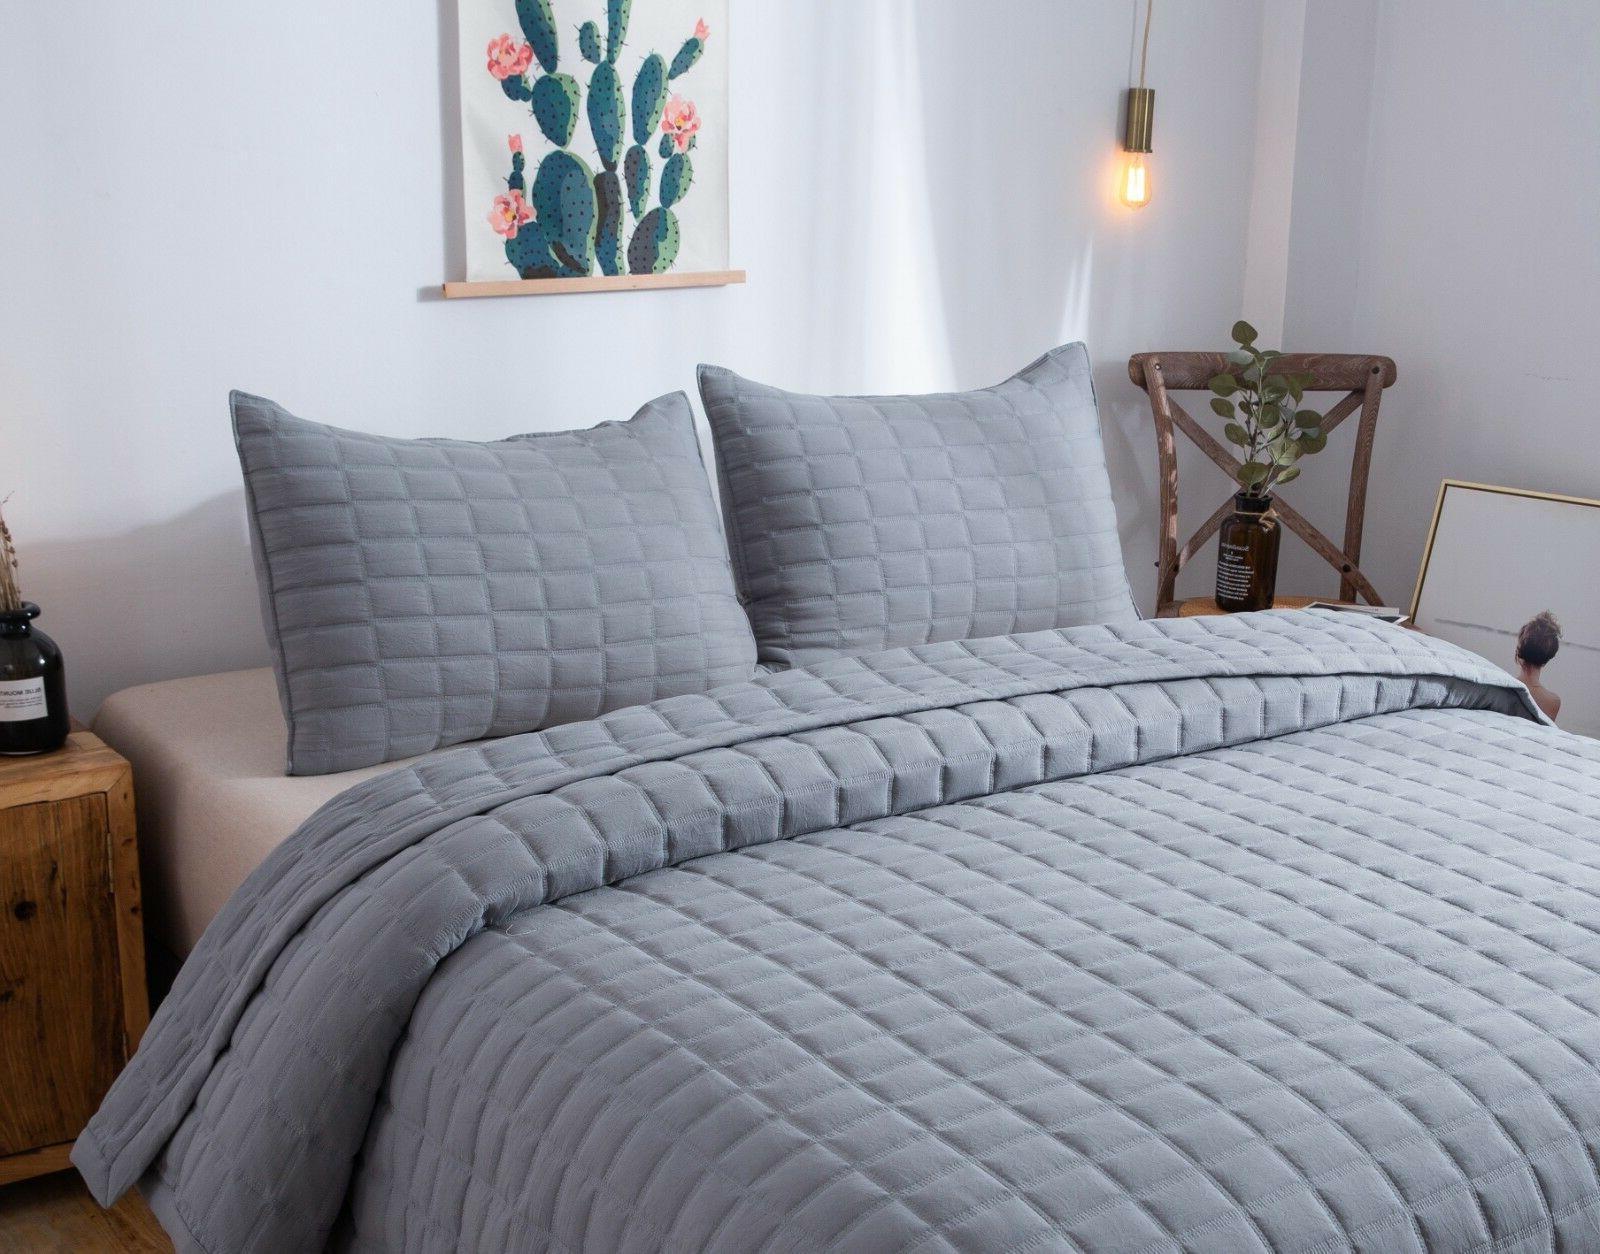 Kasentex Stone-Washed Quilt 100% Microfiber